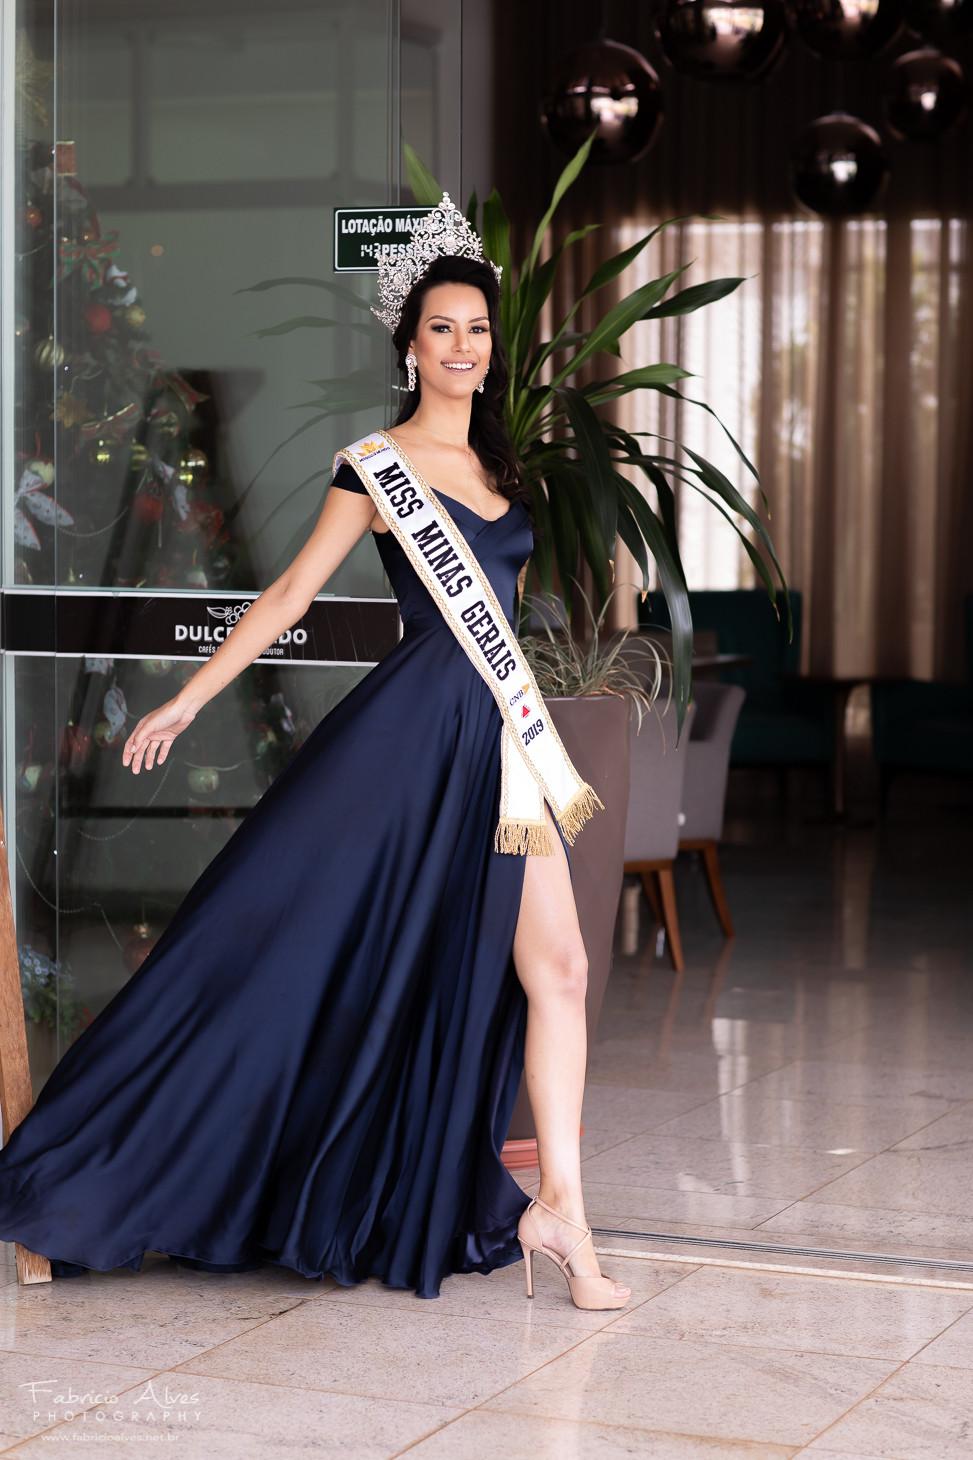 rafaella felipe, top 20 de miss brasil mundo 2019. - Página 2 Qlbrdb10